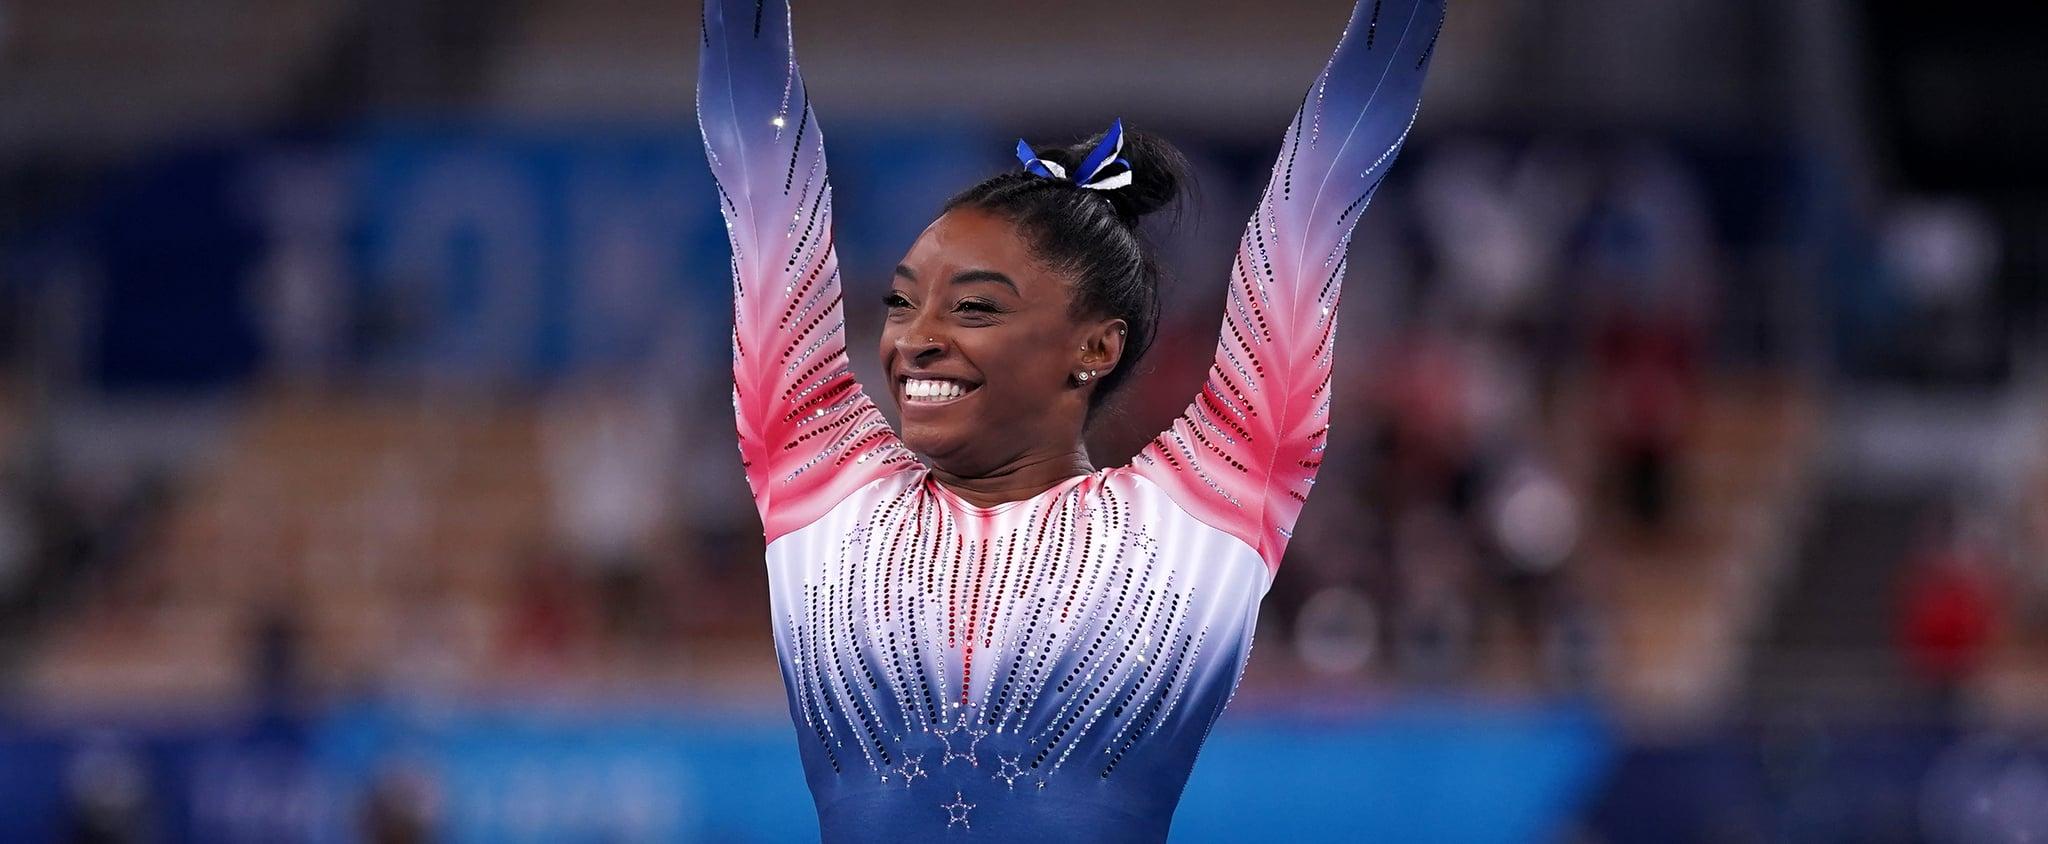 Simone Biles Wins Bronze in Tokyo Olympics Beam Final